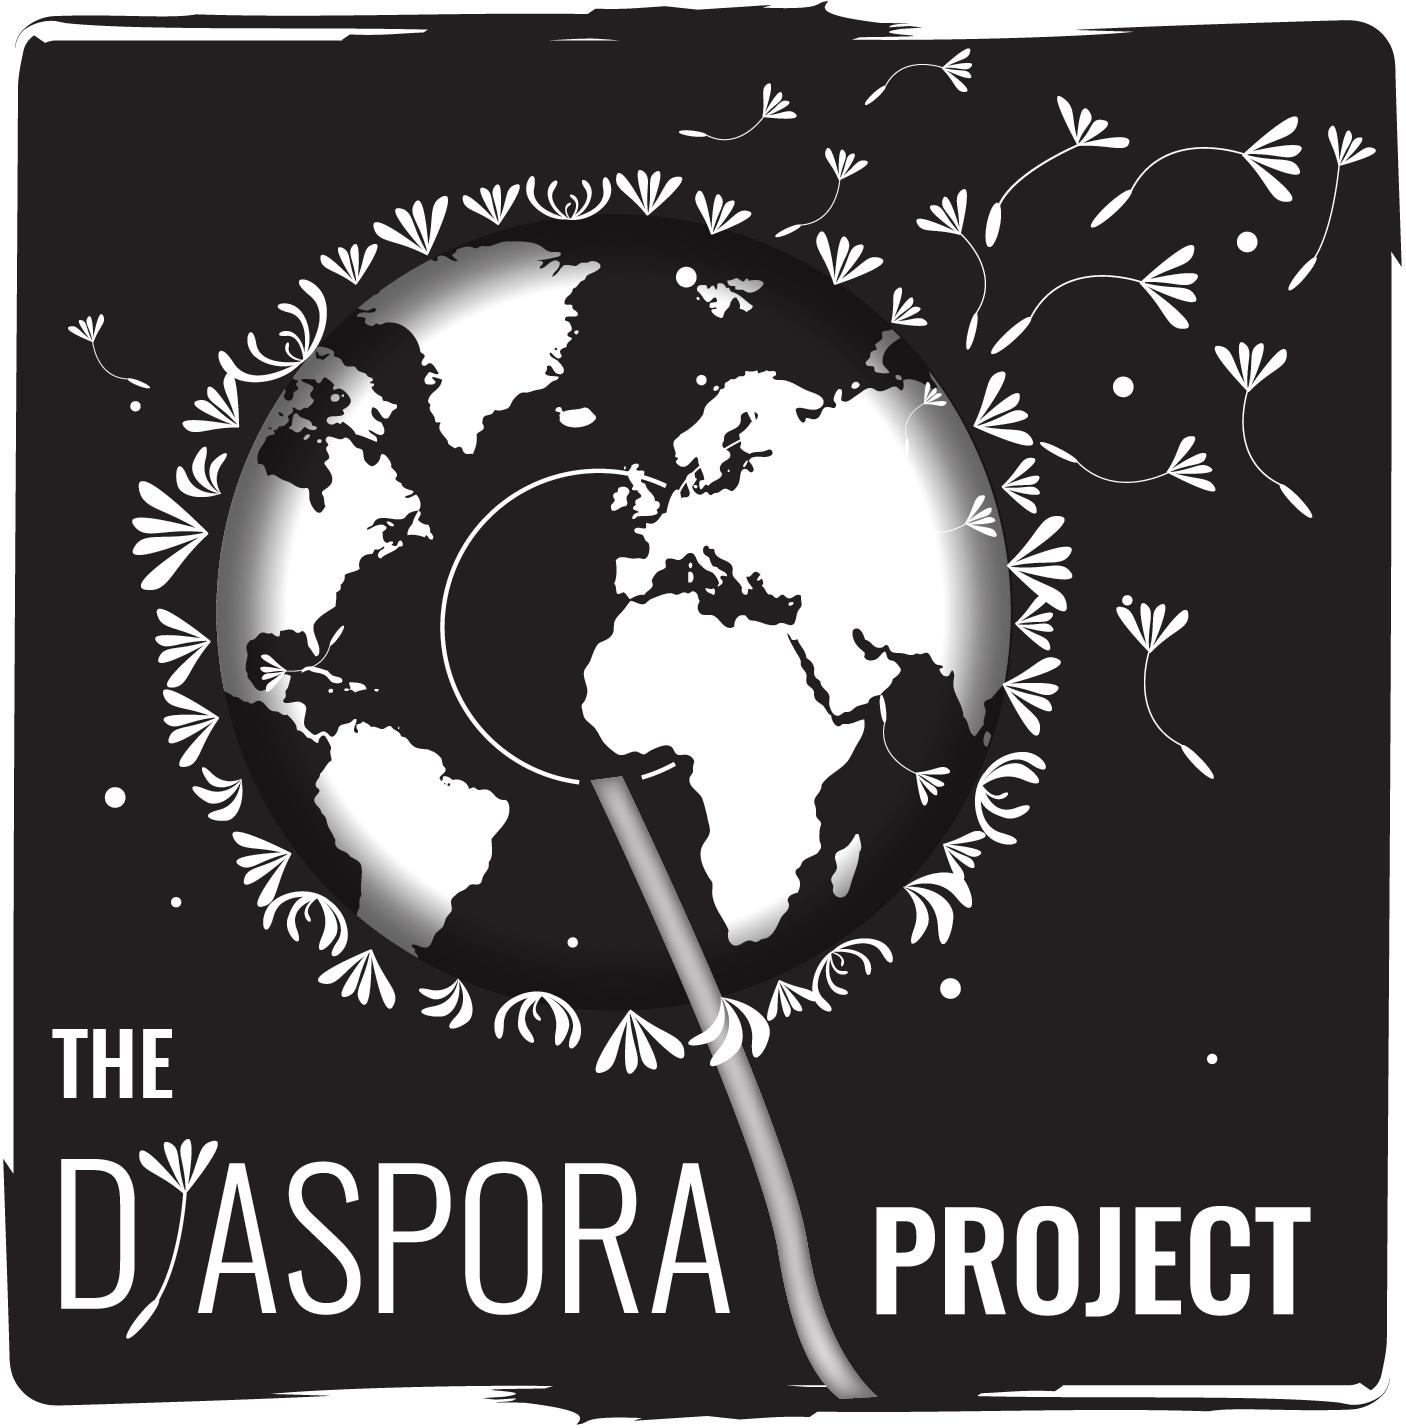 diaspora-project.png